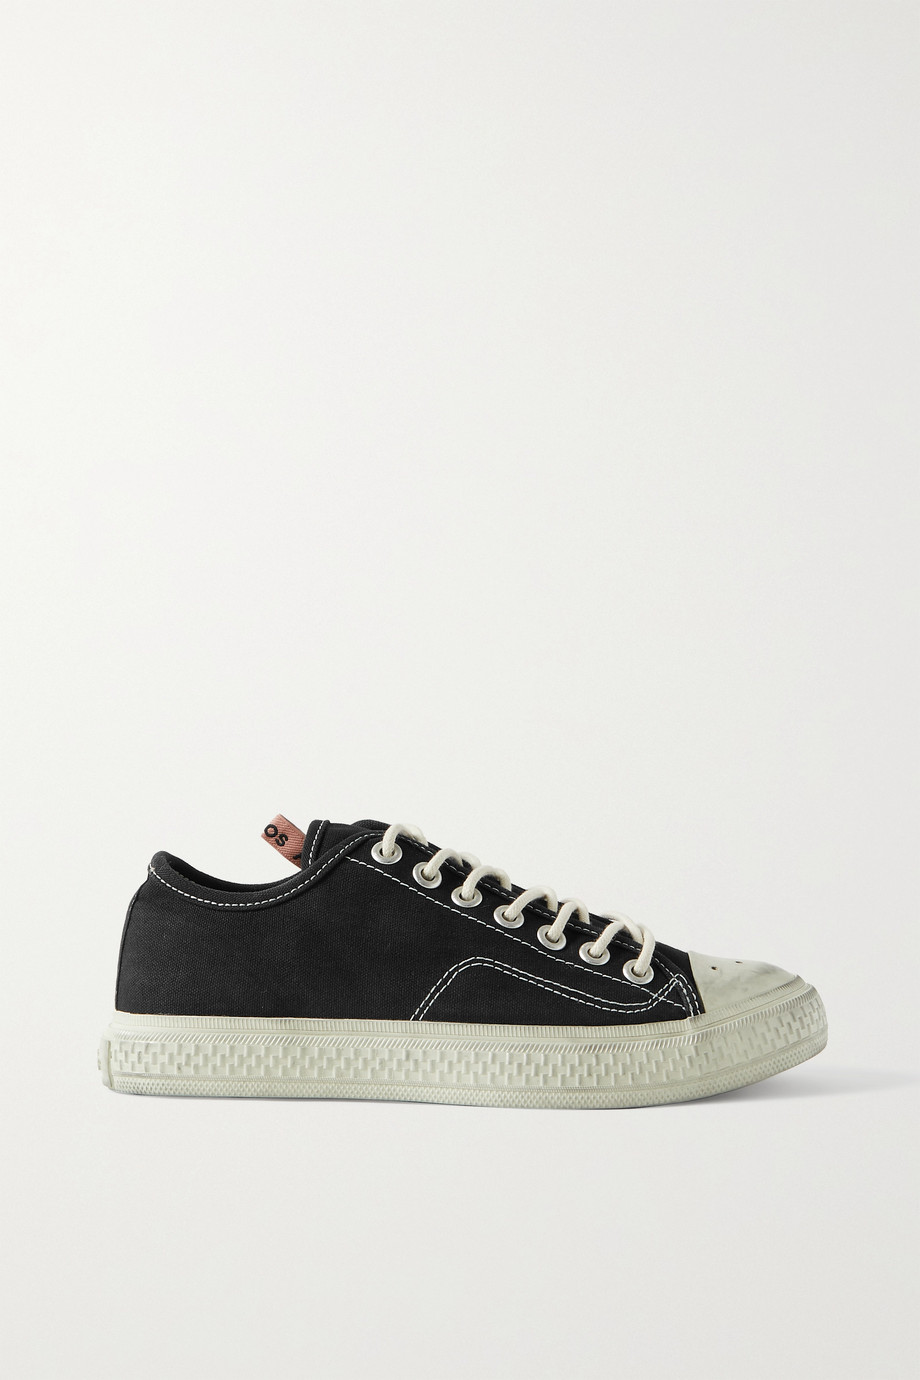 Acne Studios Distressed canvas sneakers